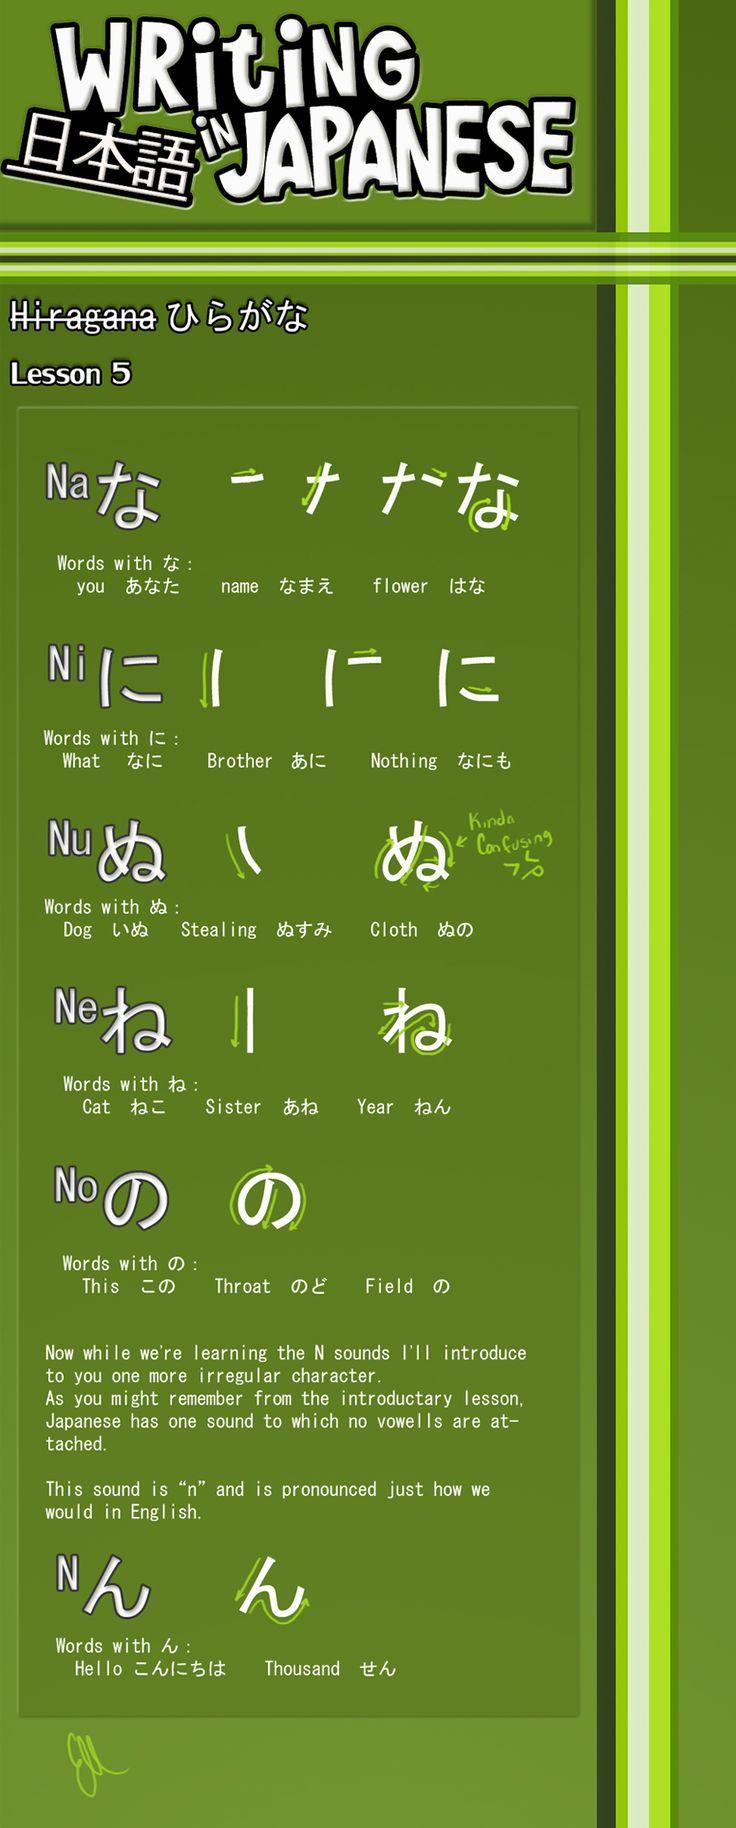 Writing Japanese – Lesson 5